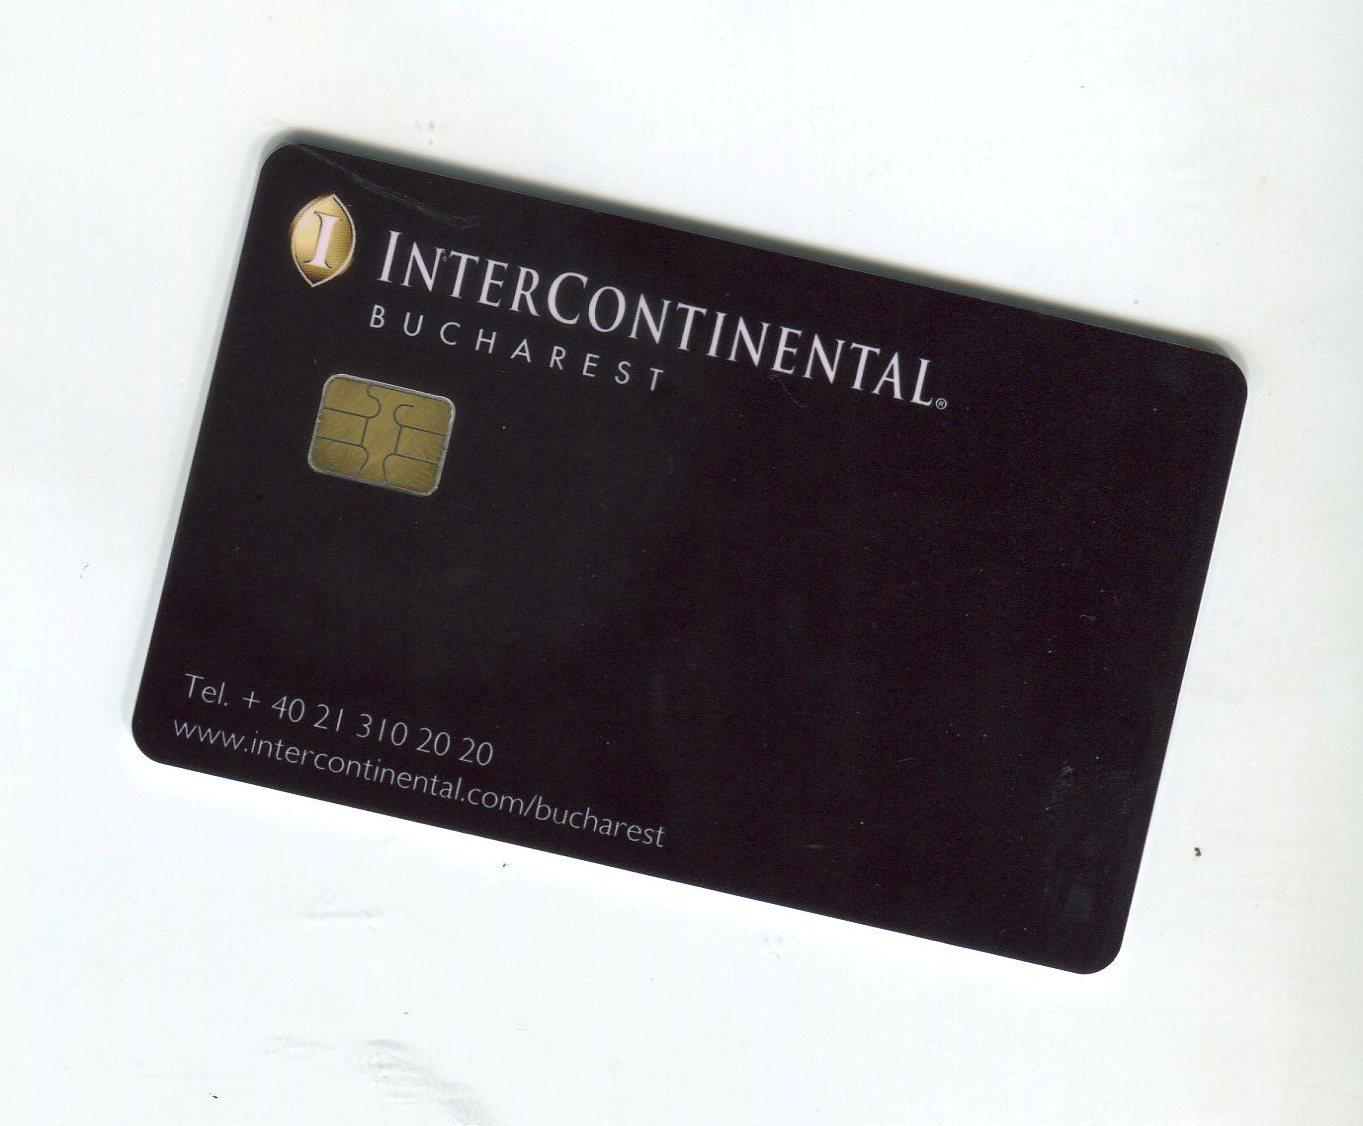 intercontinental hotel card